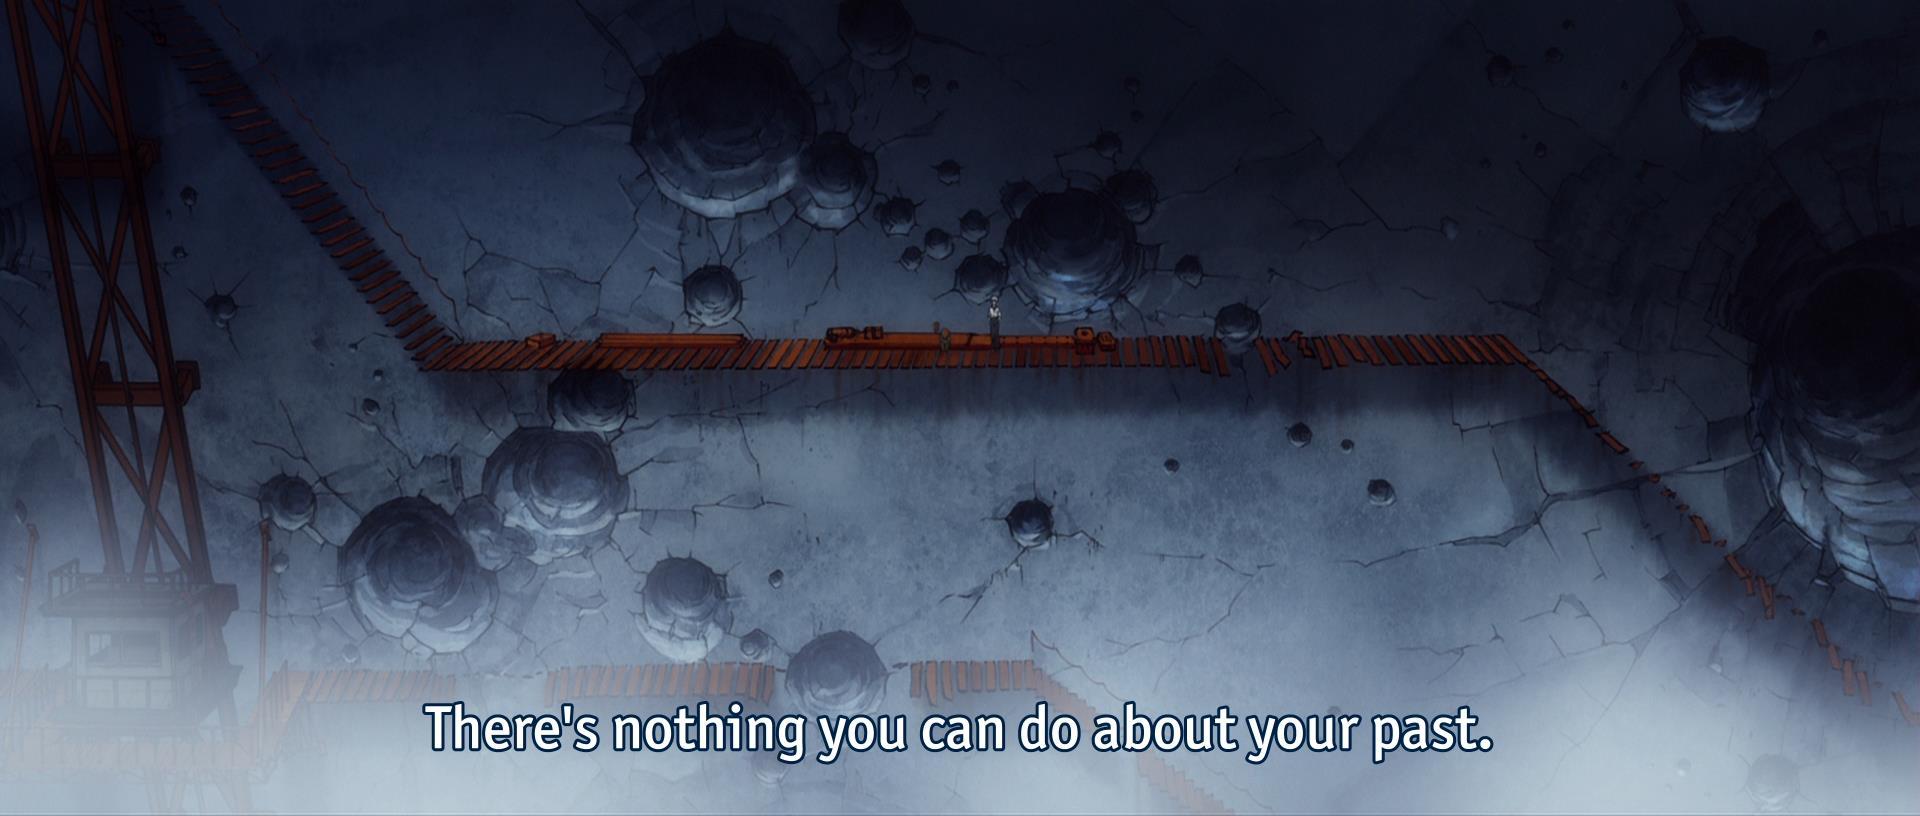 [Coalgirls]_Evangelion_3.33.0_You_Can_(Not)_Redo_(1920x816_Blu-ray_FLAC)_[FC2091F9].mkv_snapshot_00.52.18_[2014.01.31_23.18.02]